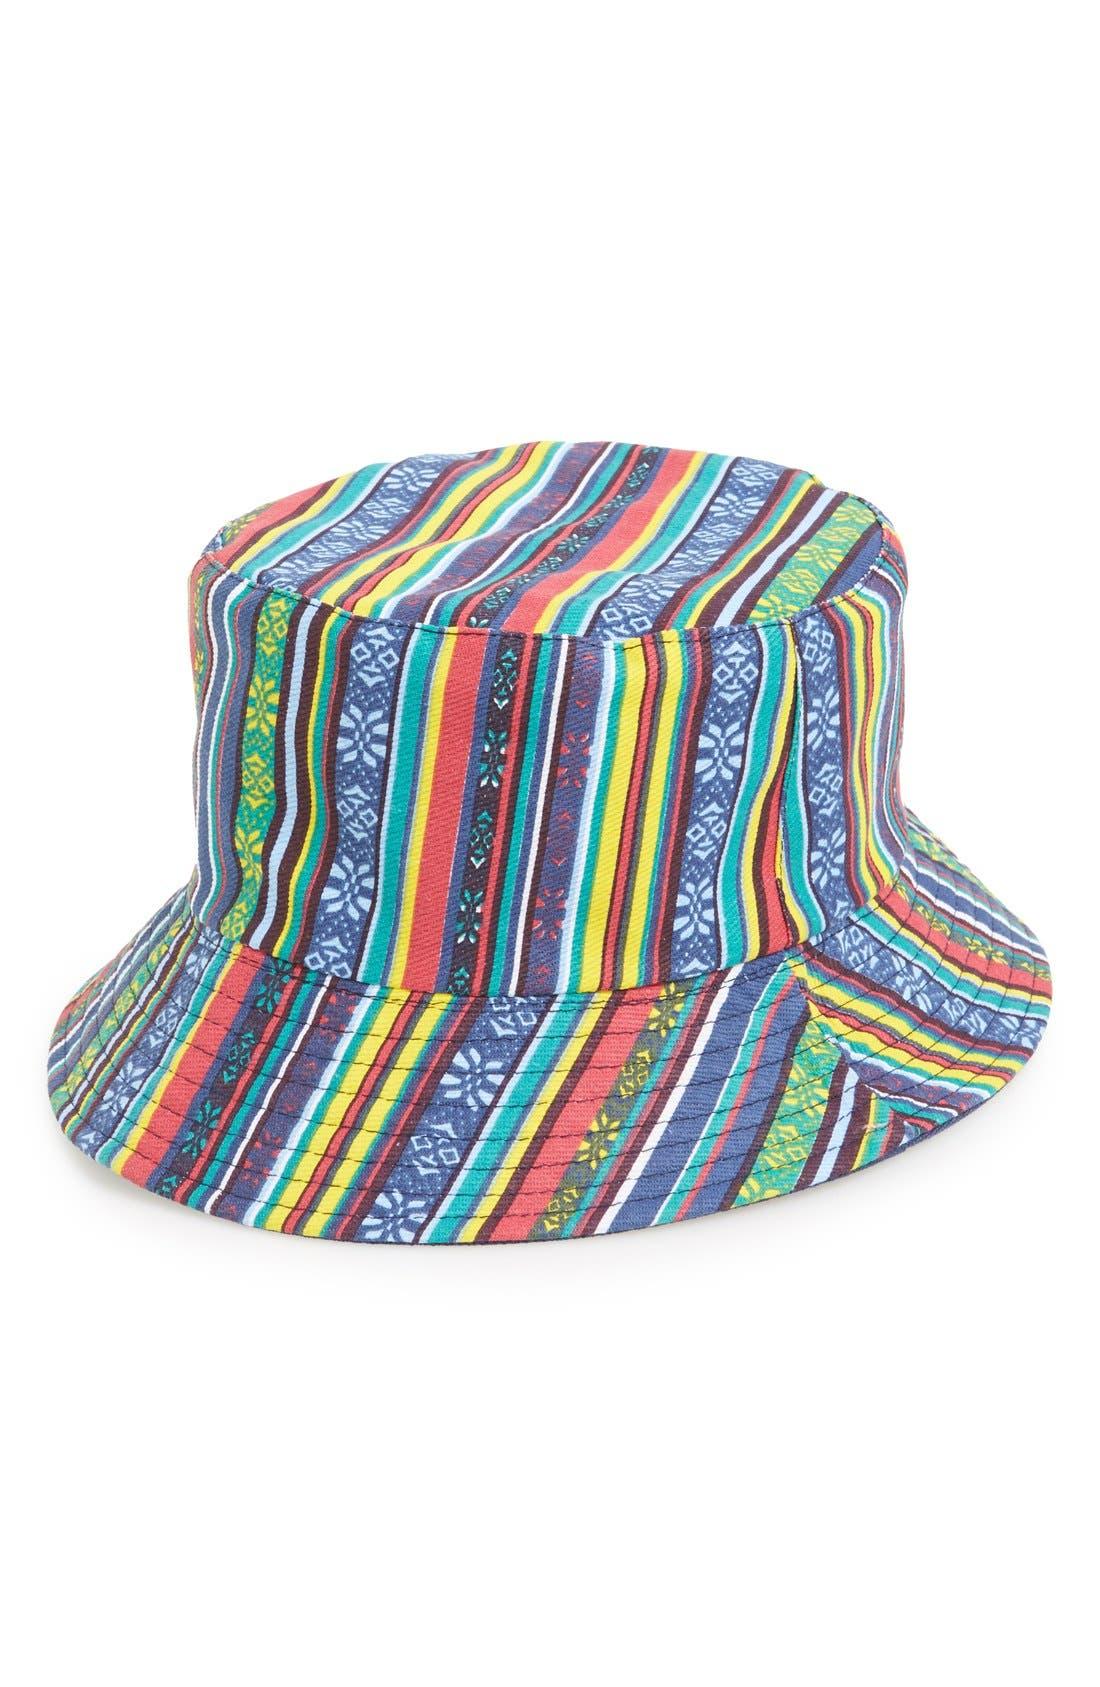 Main Image - Amici Accessories Graphic Bucket Hat (Juniors)